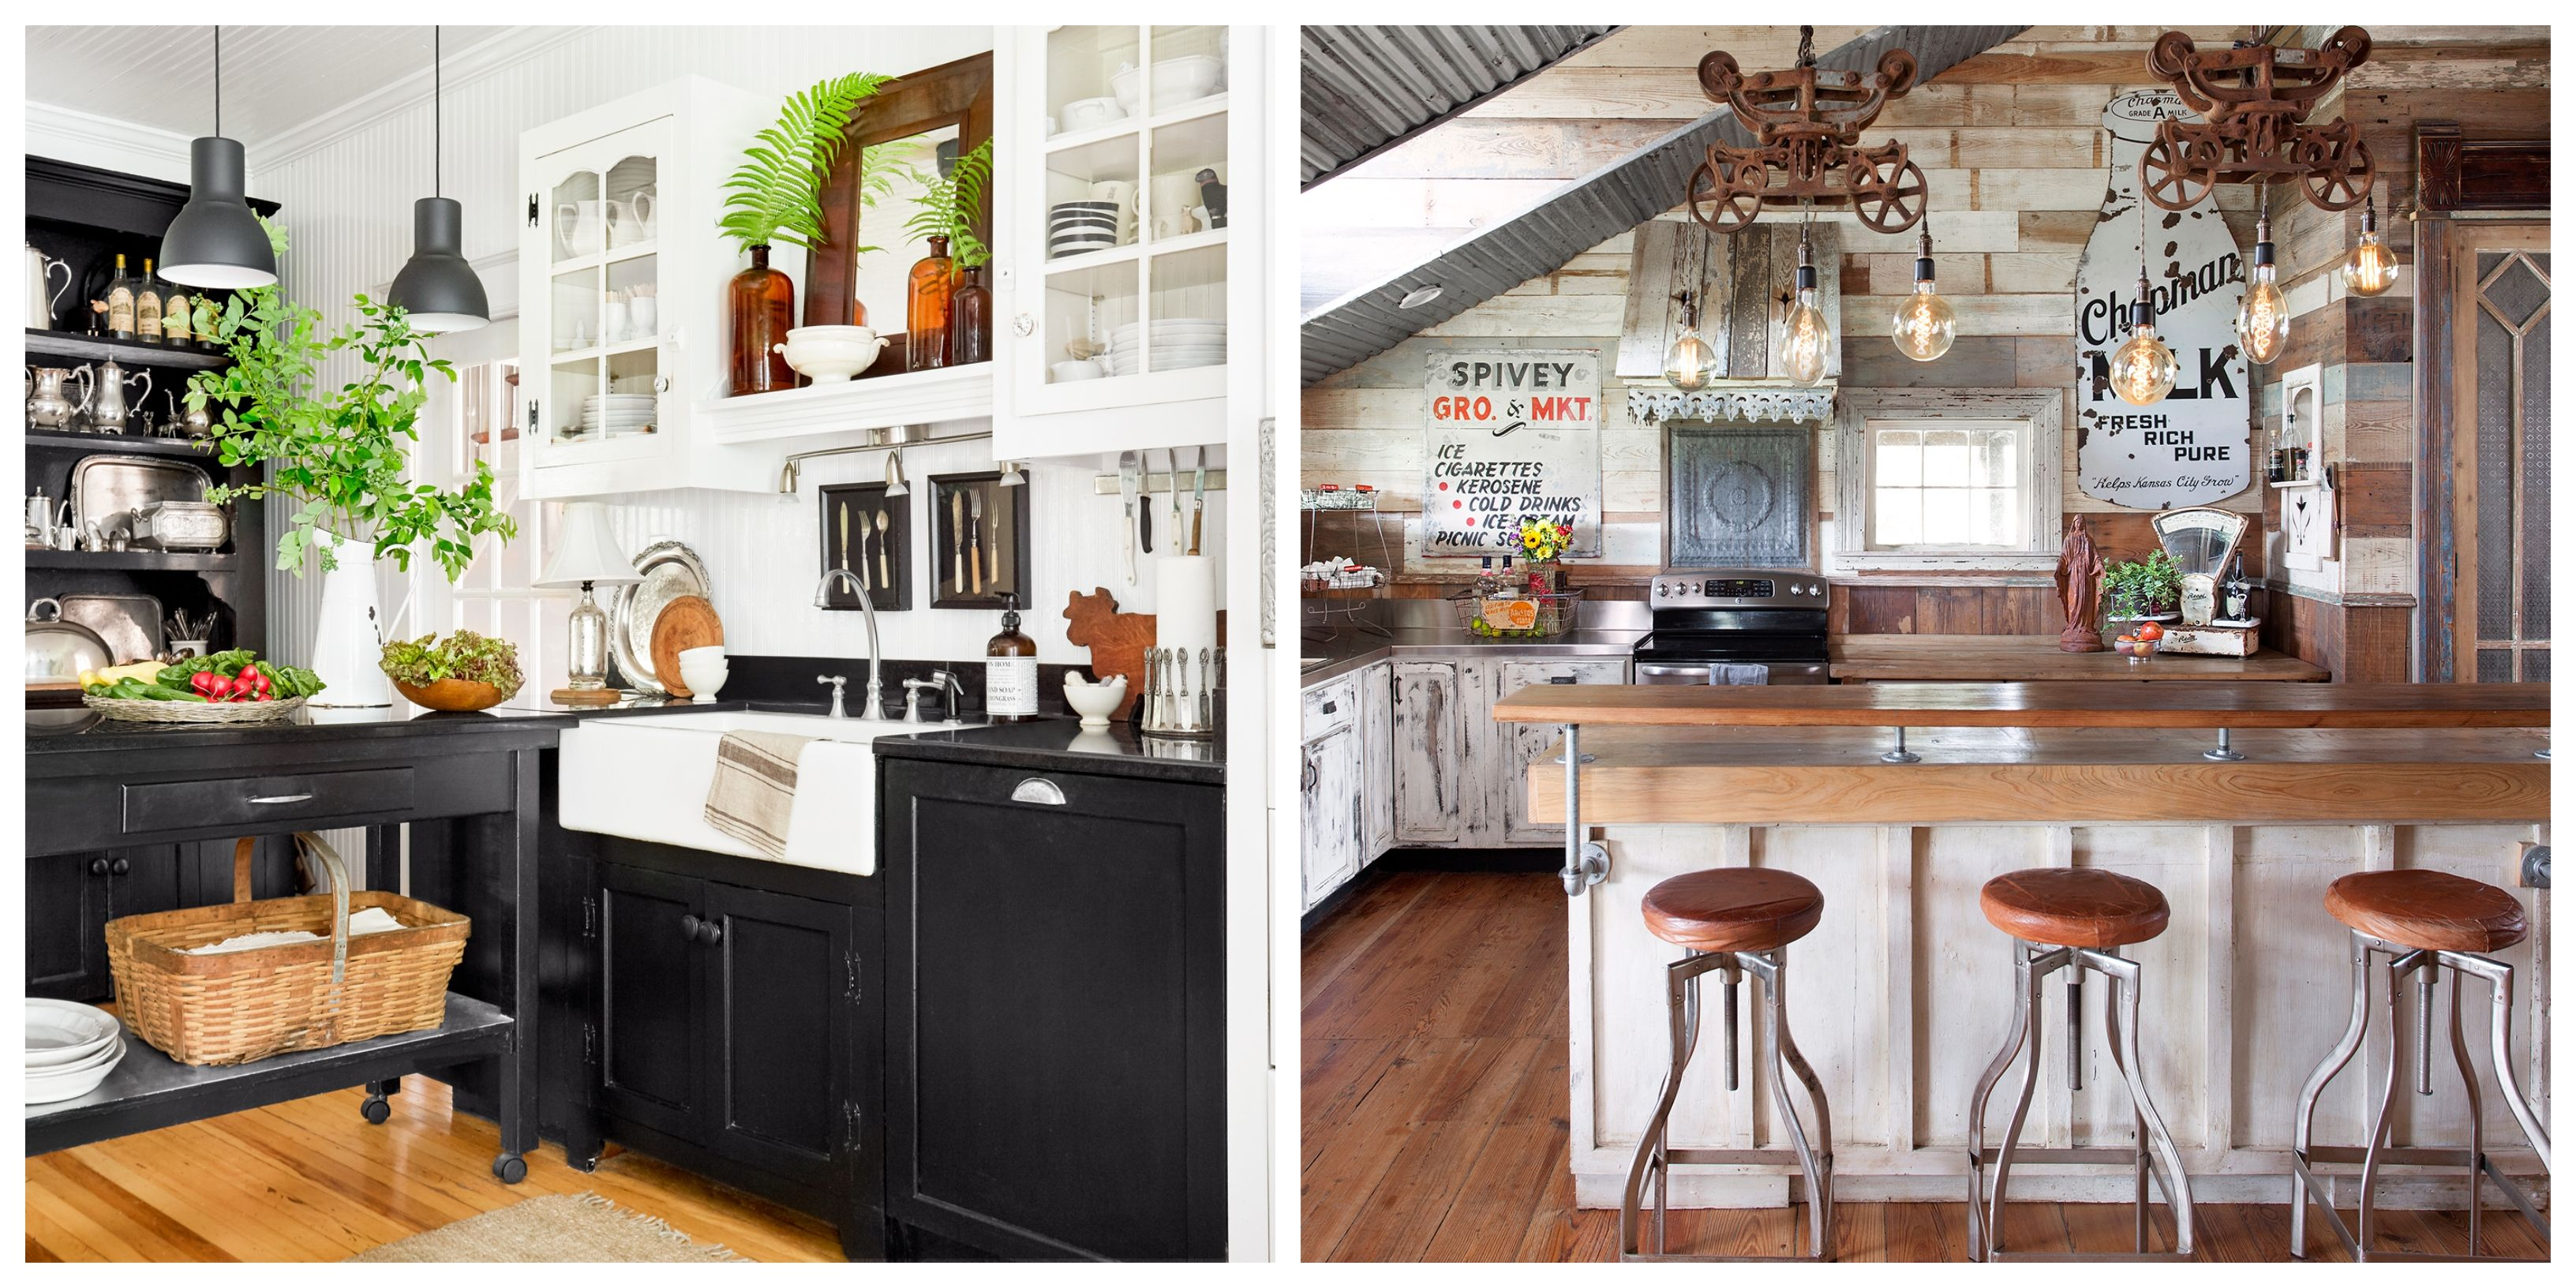 24 Farmhouse Style Kitchens Rustic Decor Ideas For Kitchens